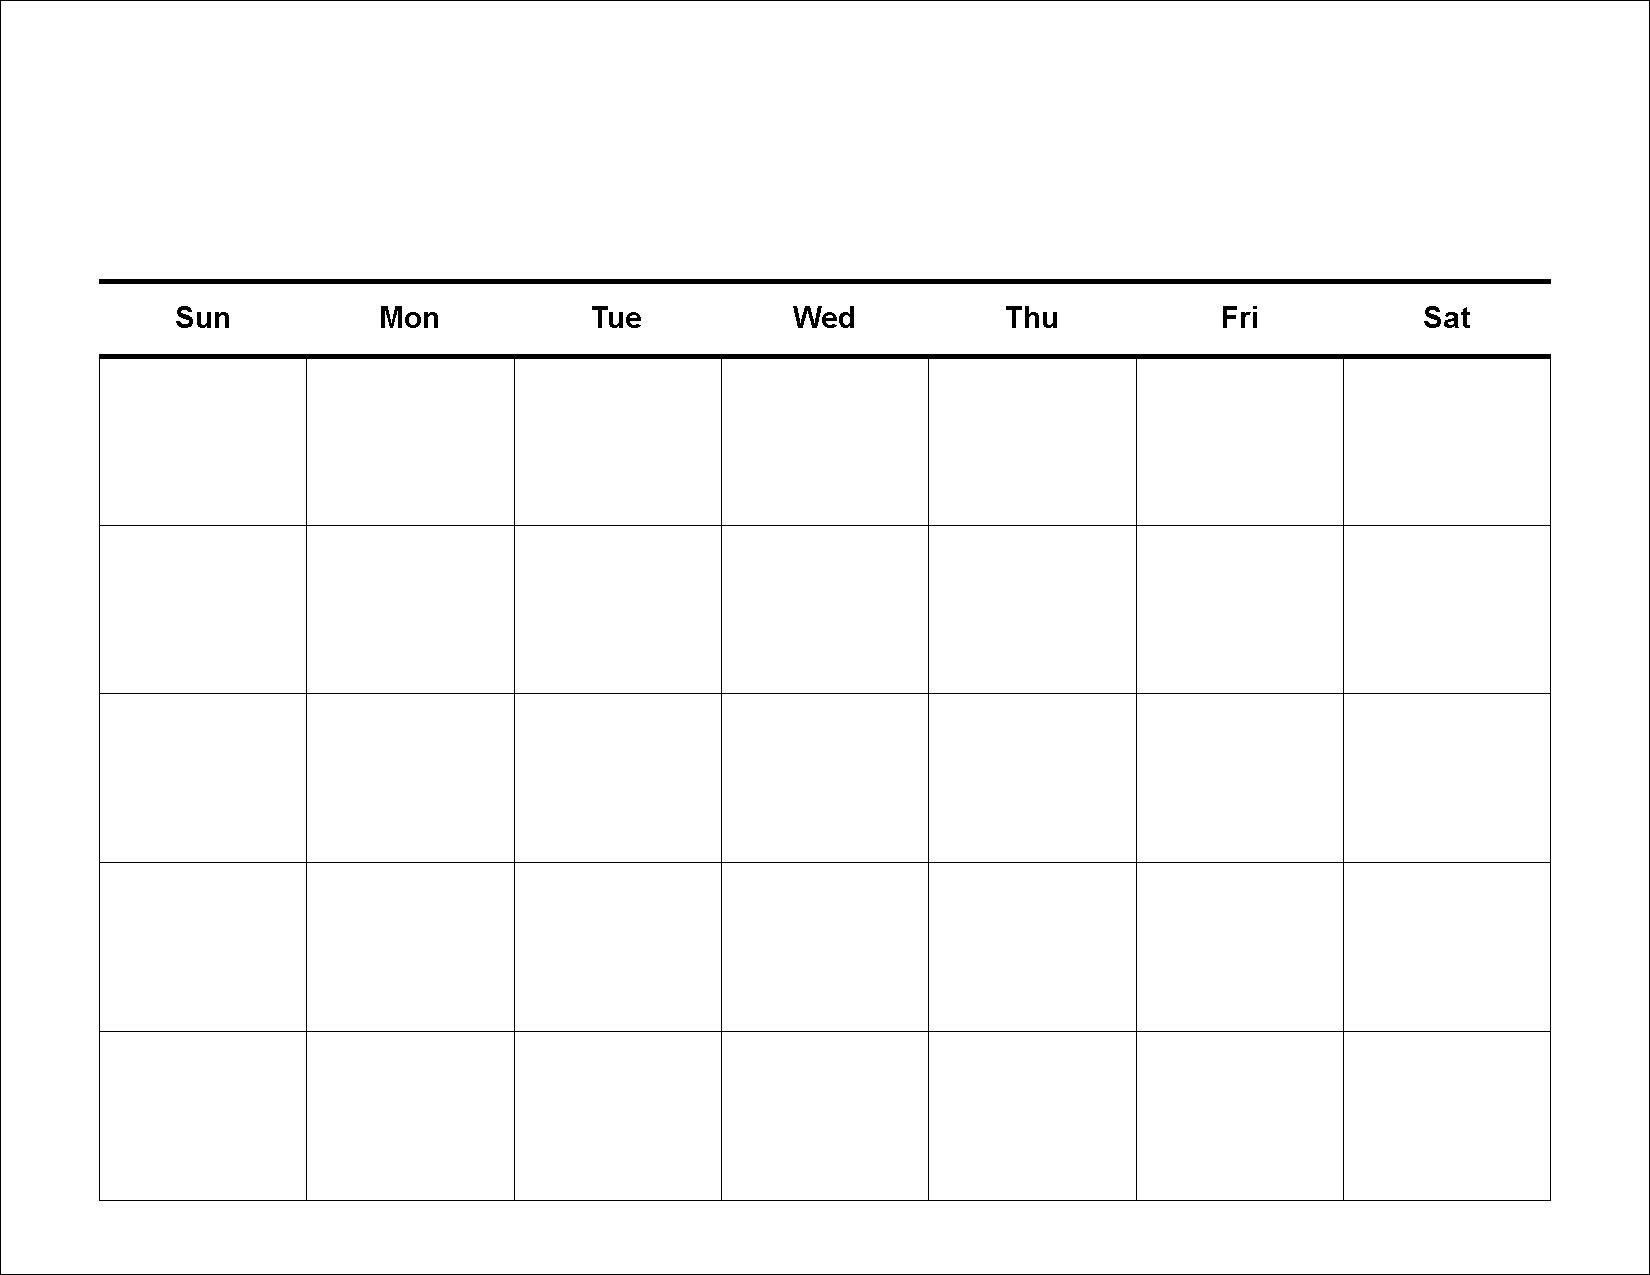 Dayday Calendar Template - Yeniscale.co  Free Blank 5 Day Calendar